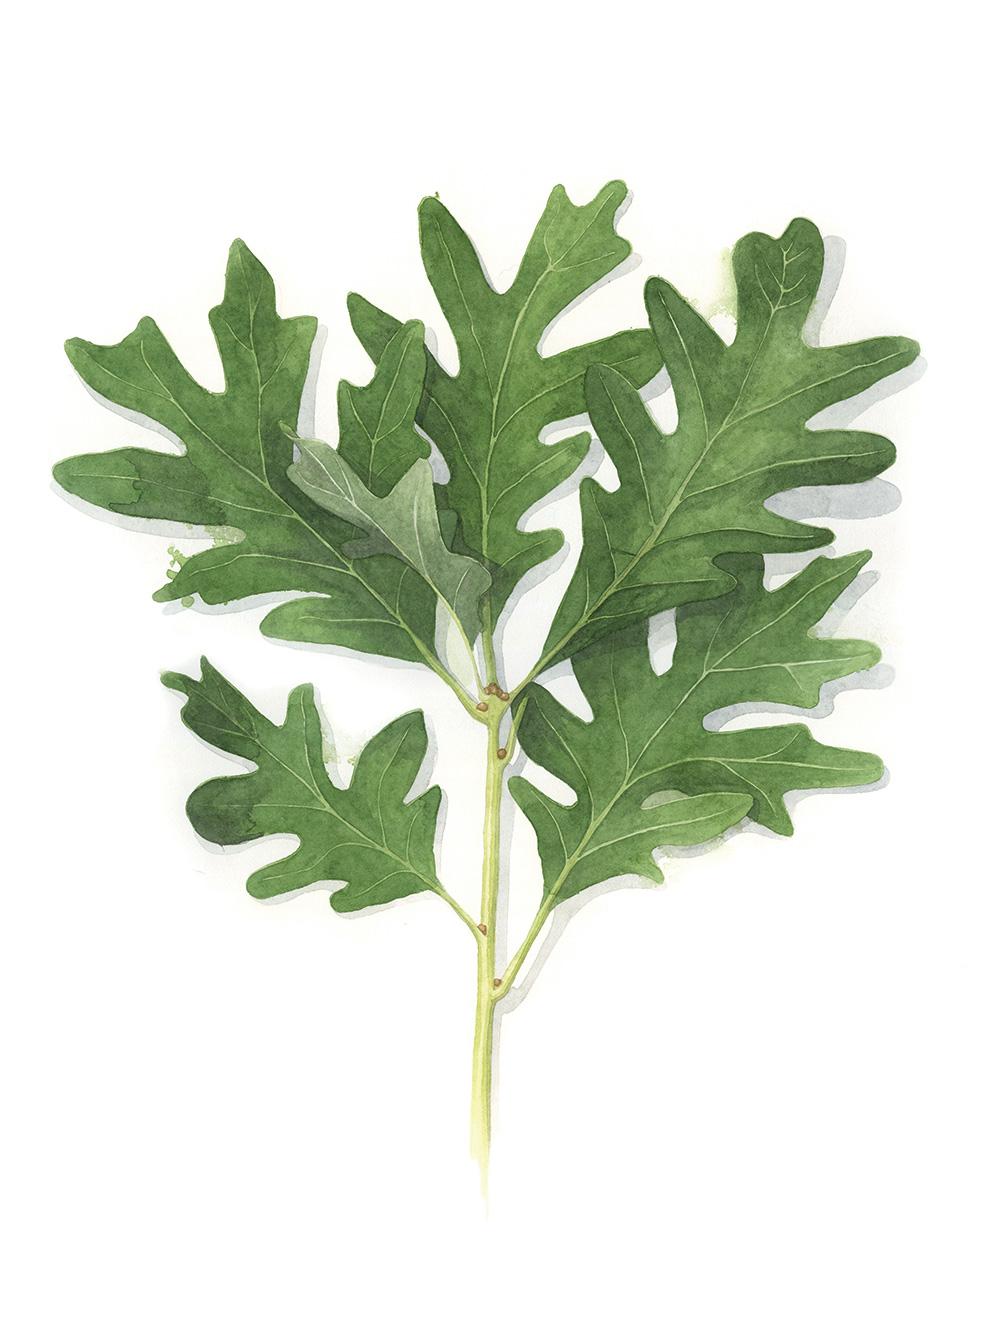 White-Oak-Leaf-AmandaFarquharson.jpg